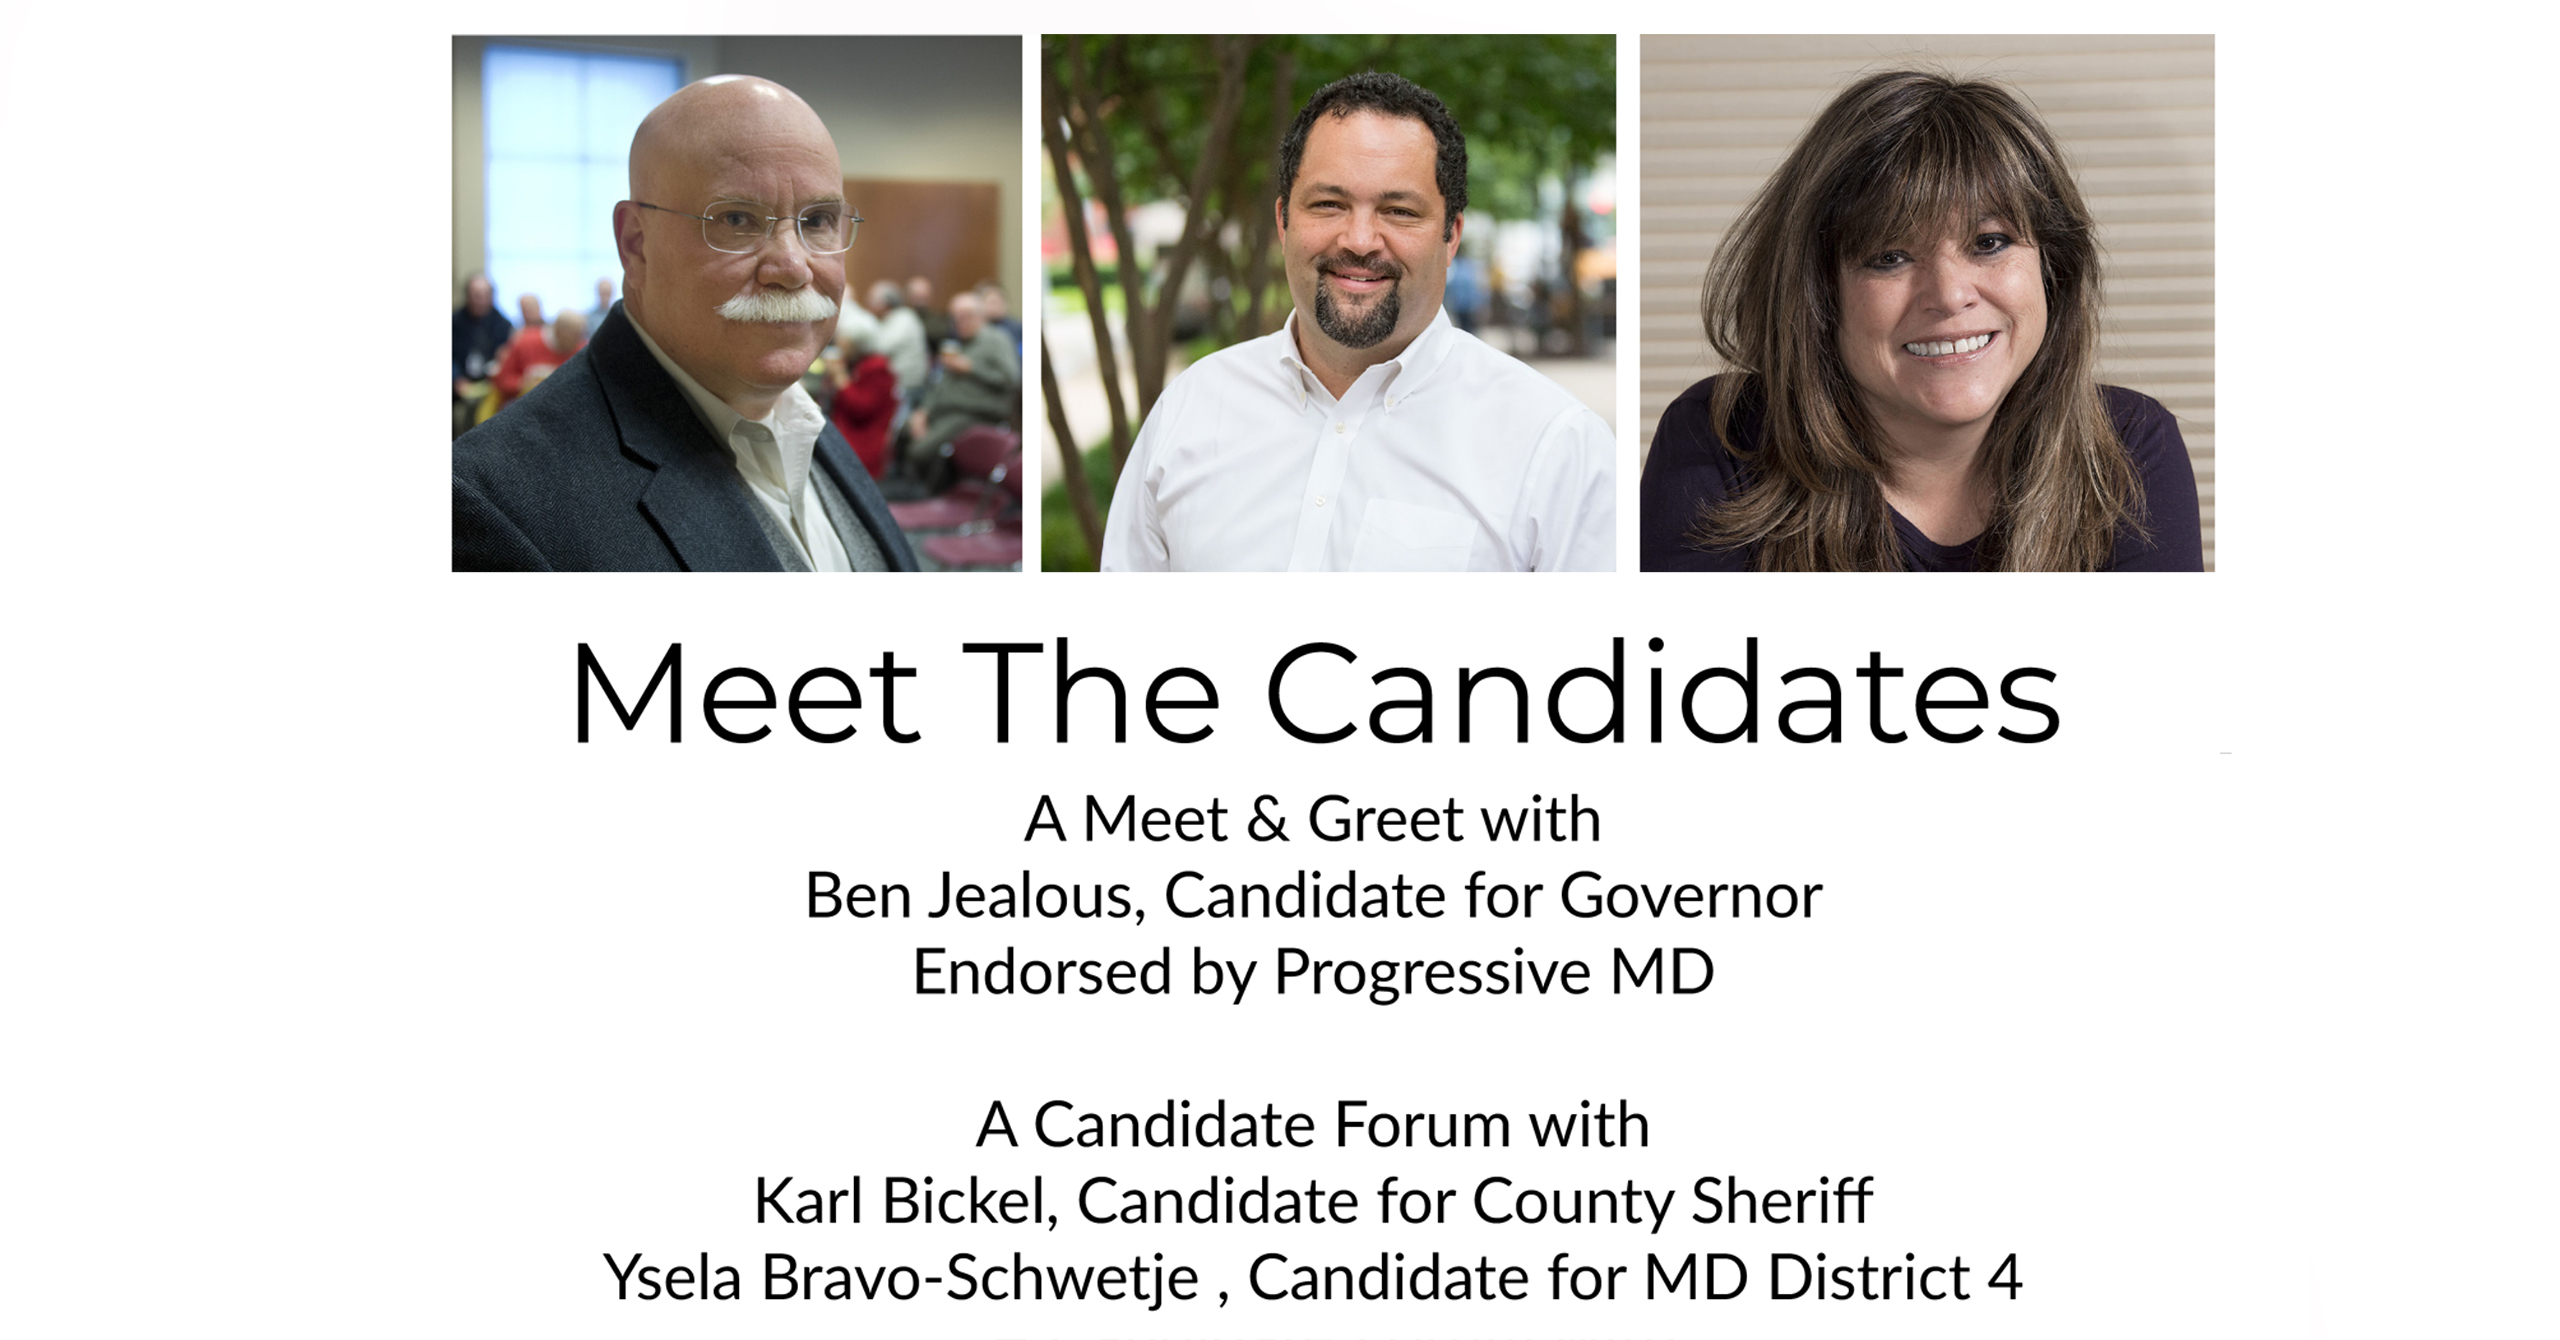 FCP_Meet_the_candidates_banner.jpg